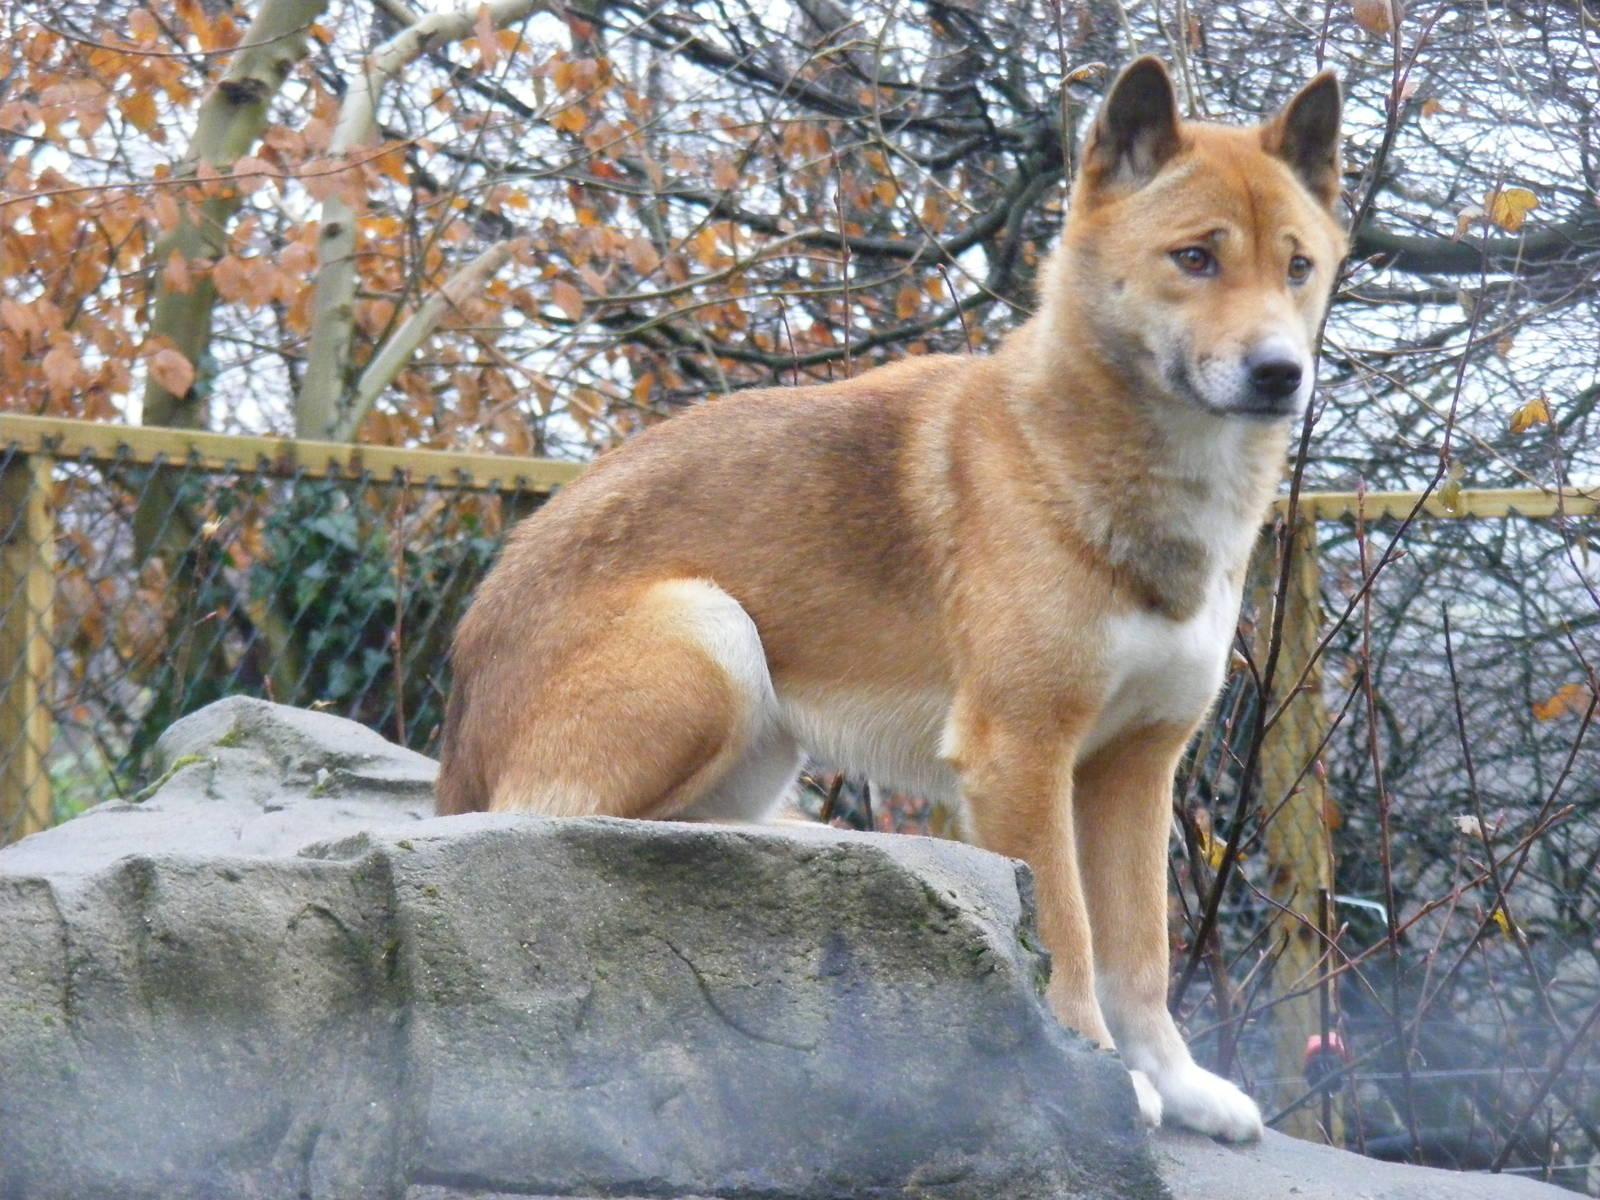 Telomian Dog: Telomian Kota New Guinea Singing Dog Exmoor Breed